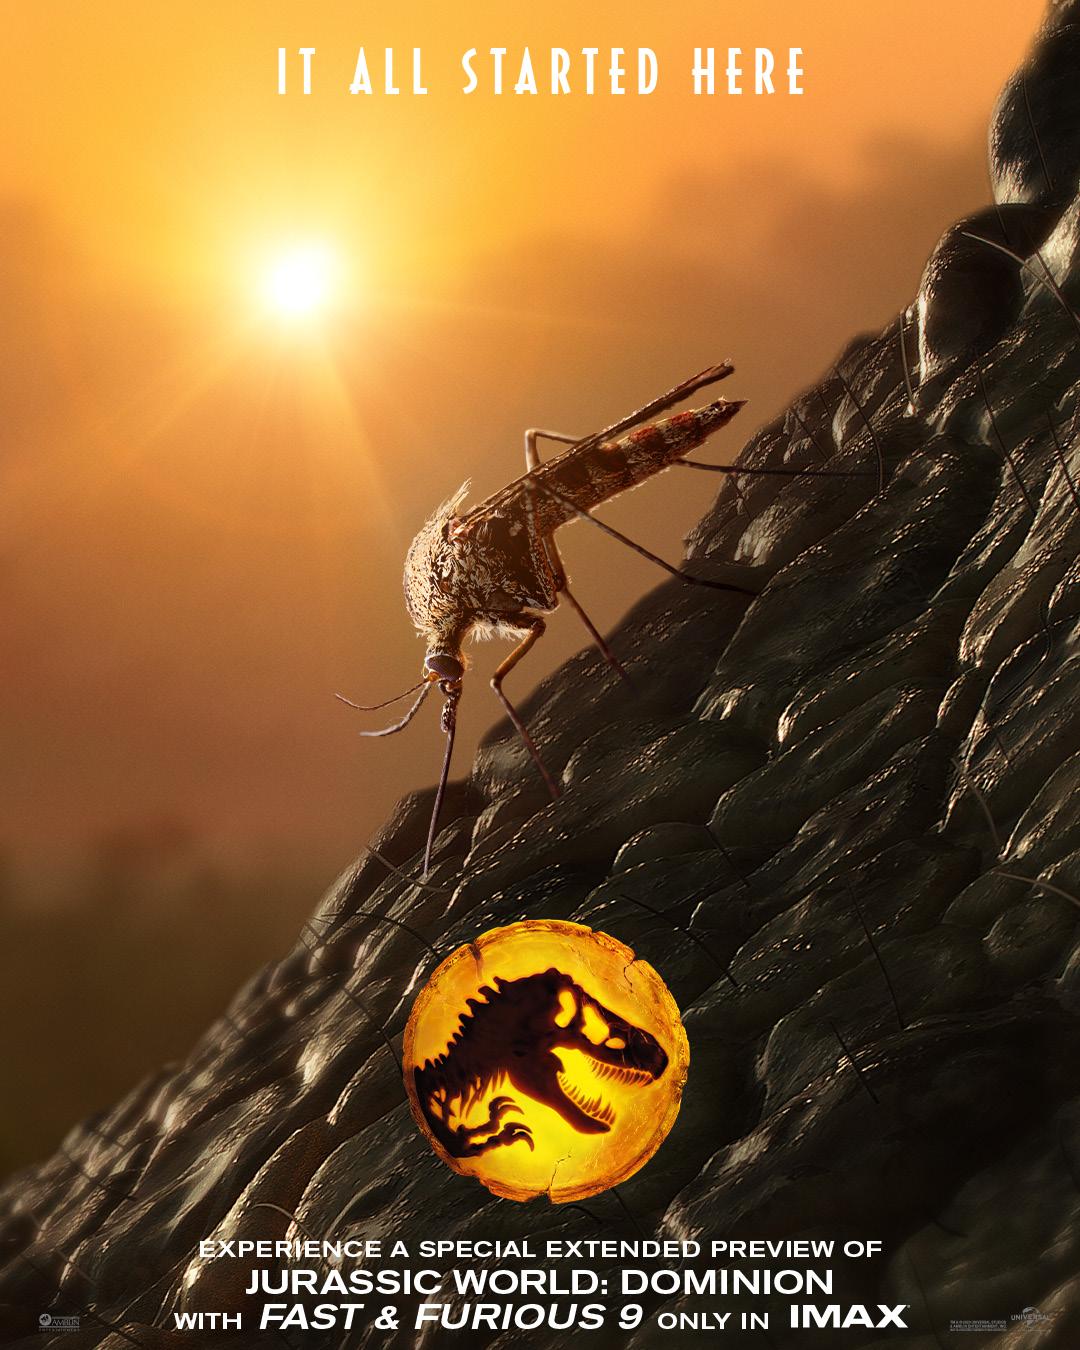 Movie poster for Jurrassic Park film.